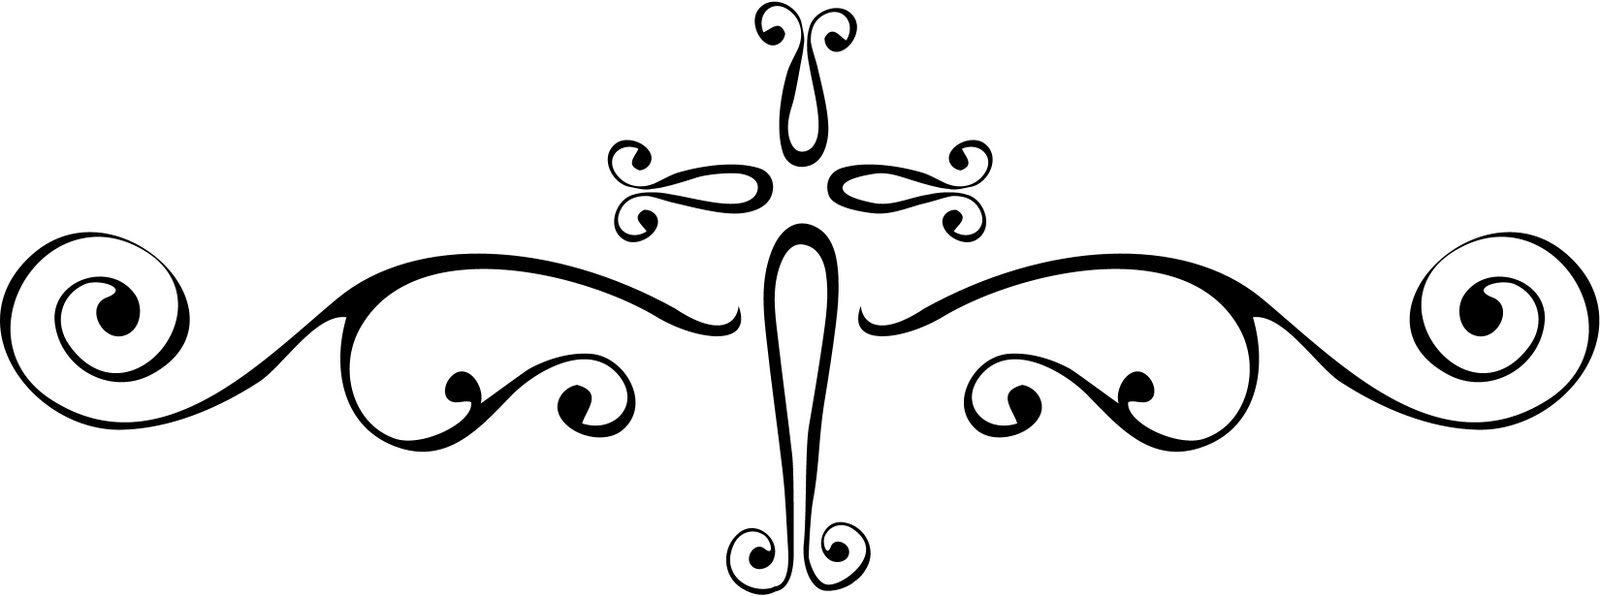 Filigree Cross Clip Art ..-Filigree Cross Clip Art ..-9